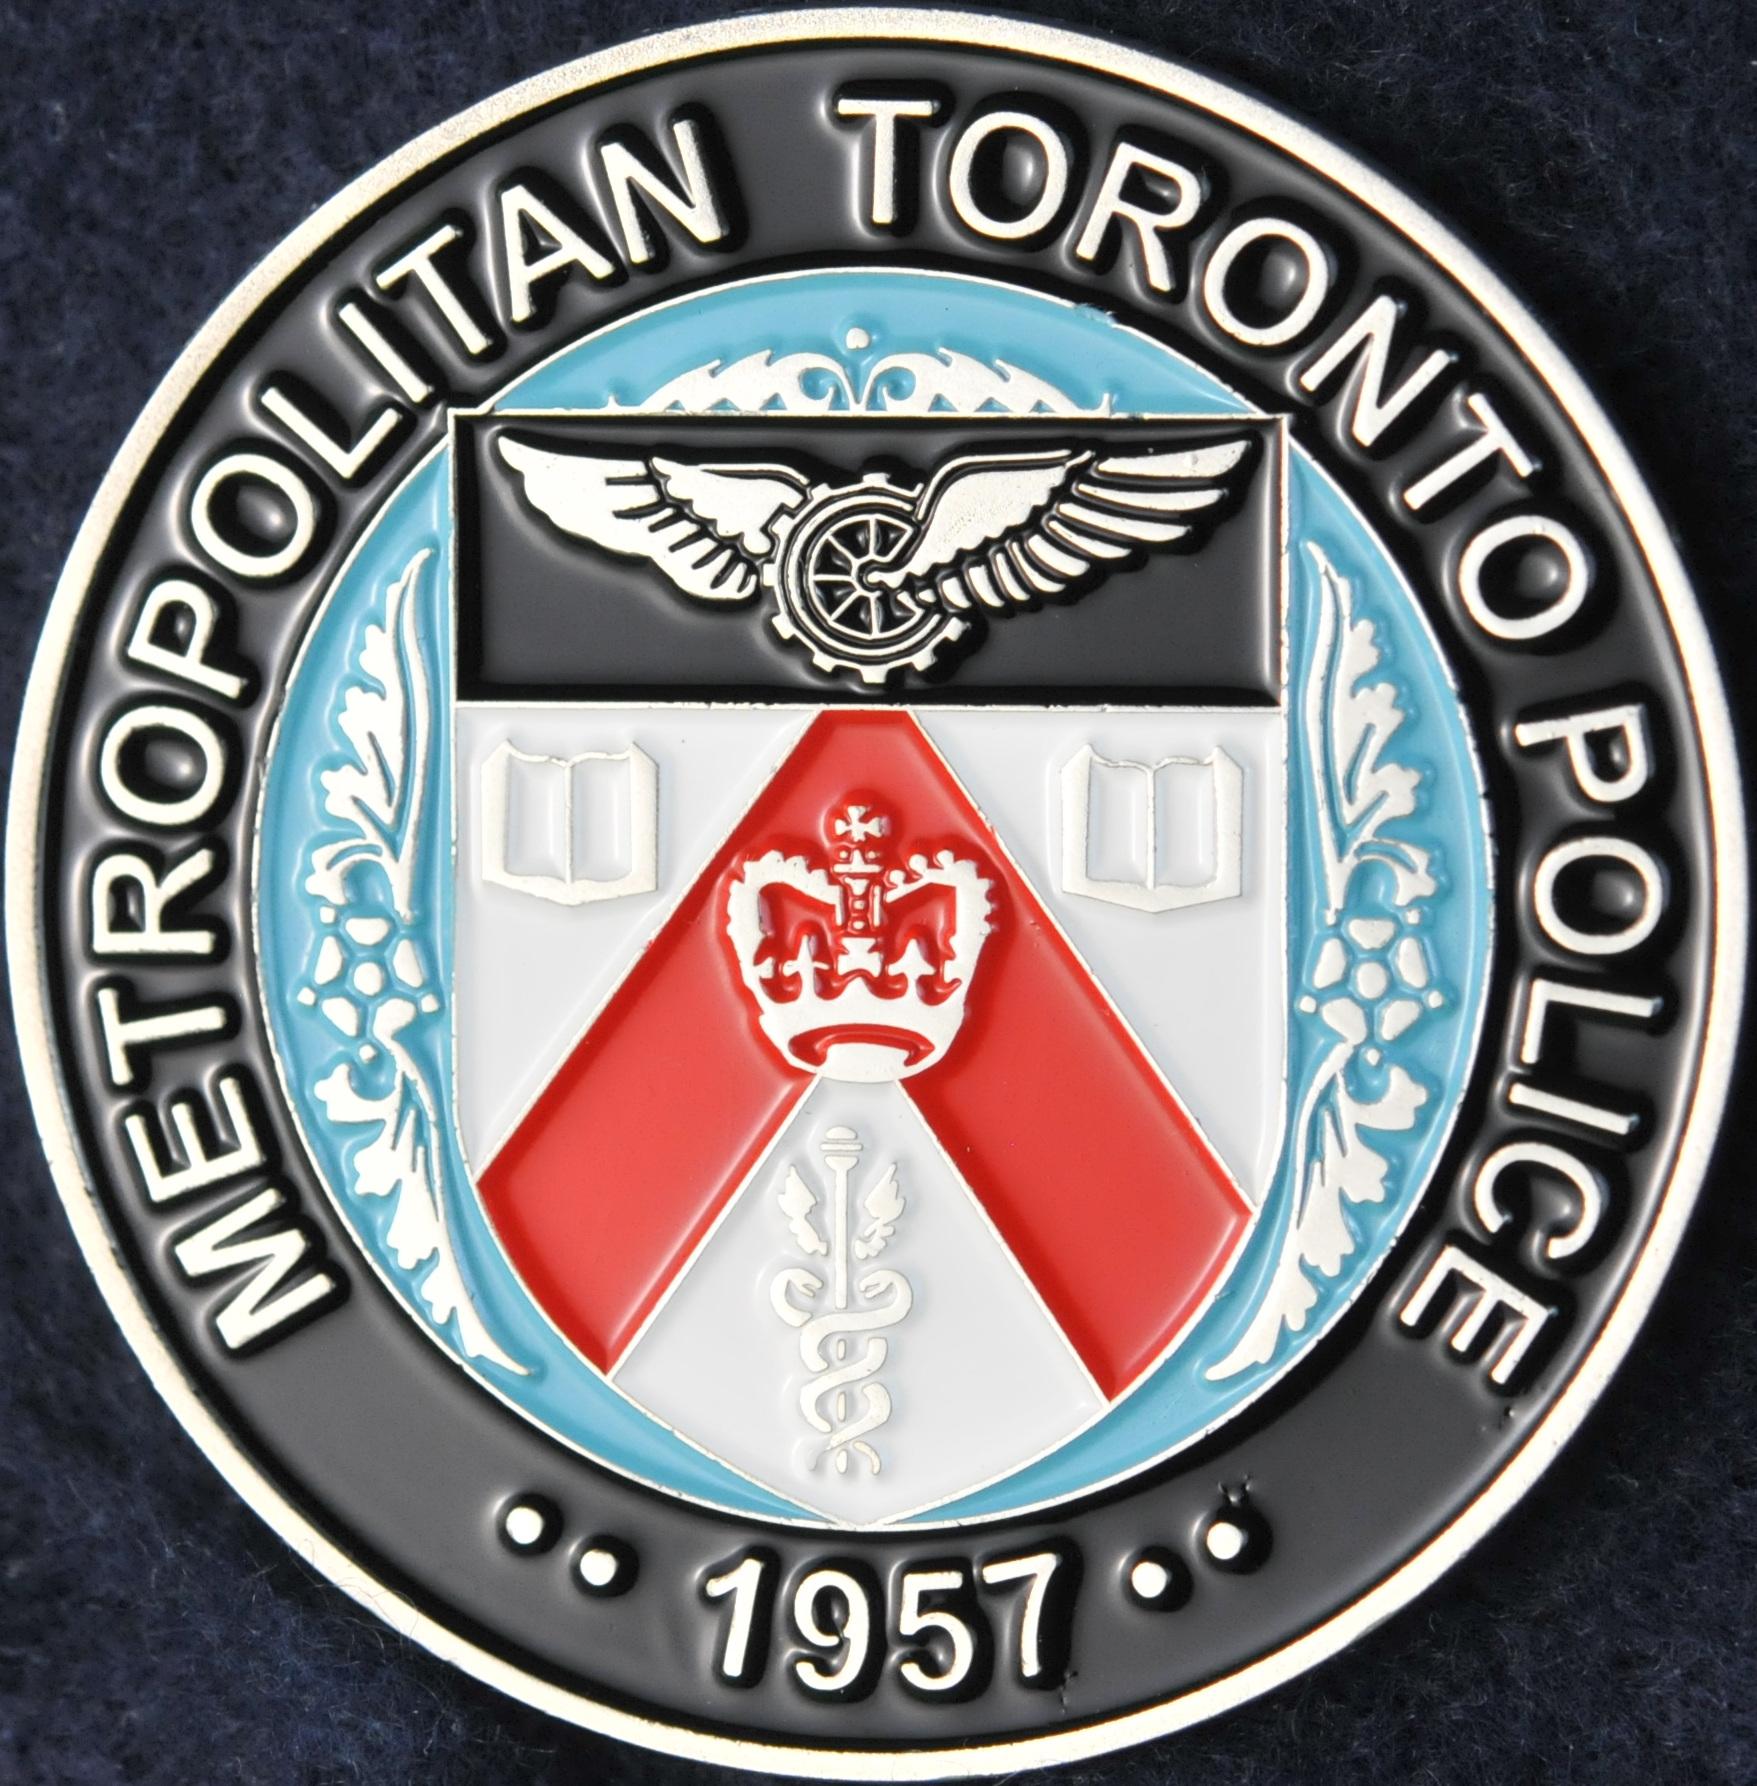 Toronto Police Service North York Township 32 Division